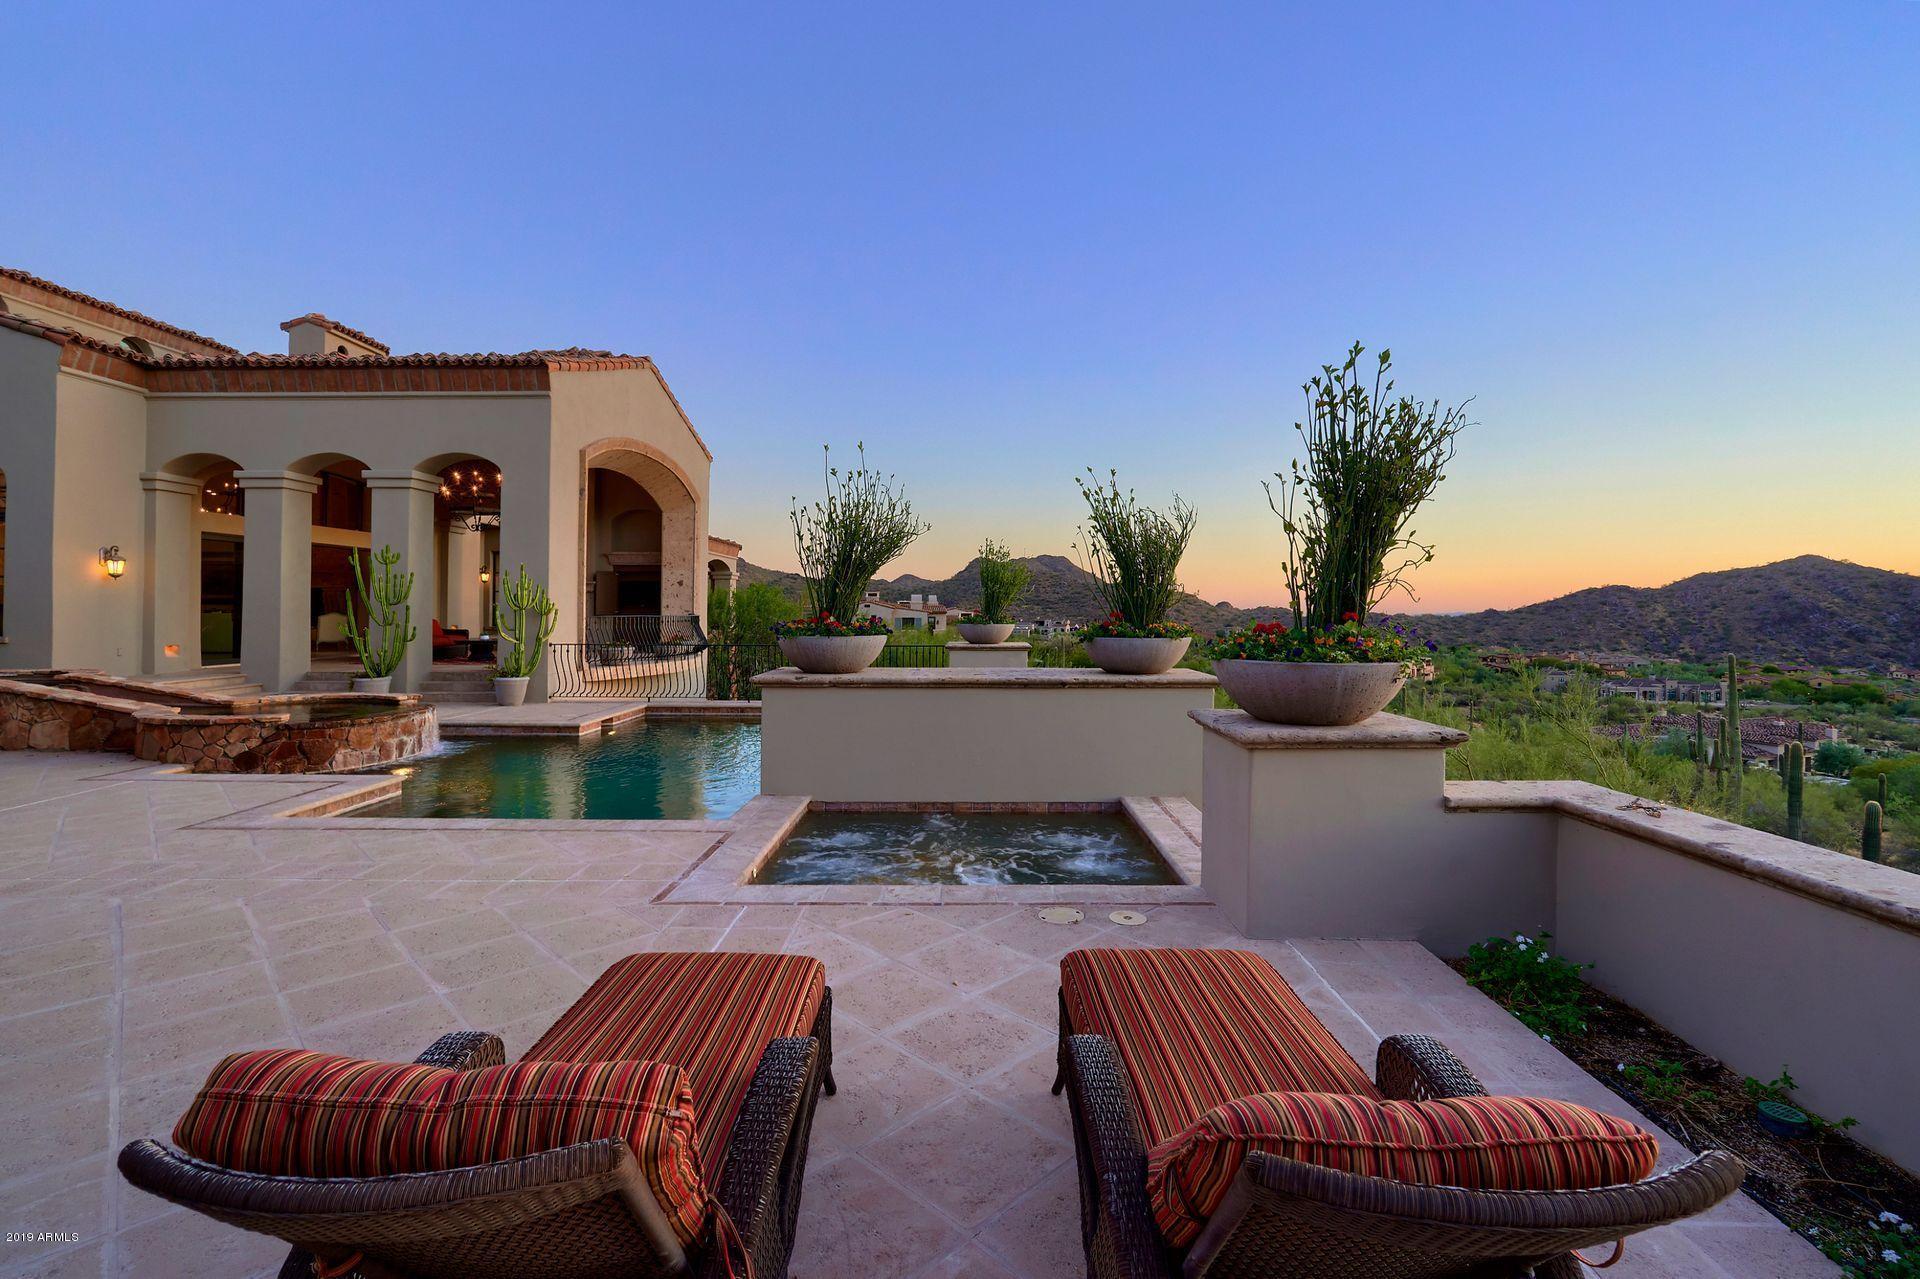 20880 N 112th St Scottsdale, AZ